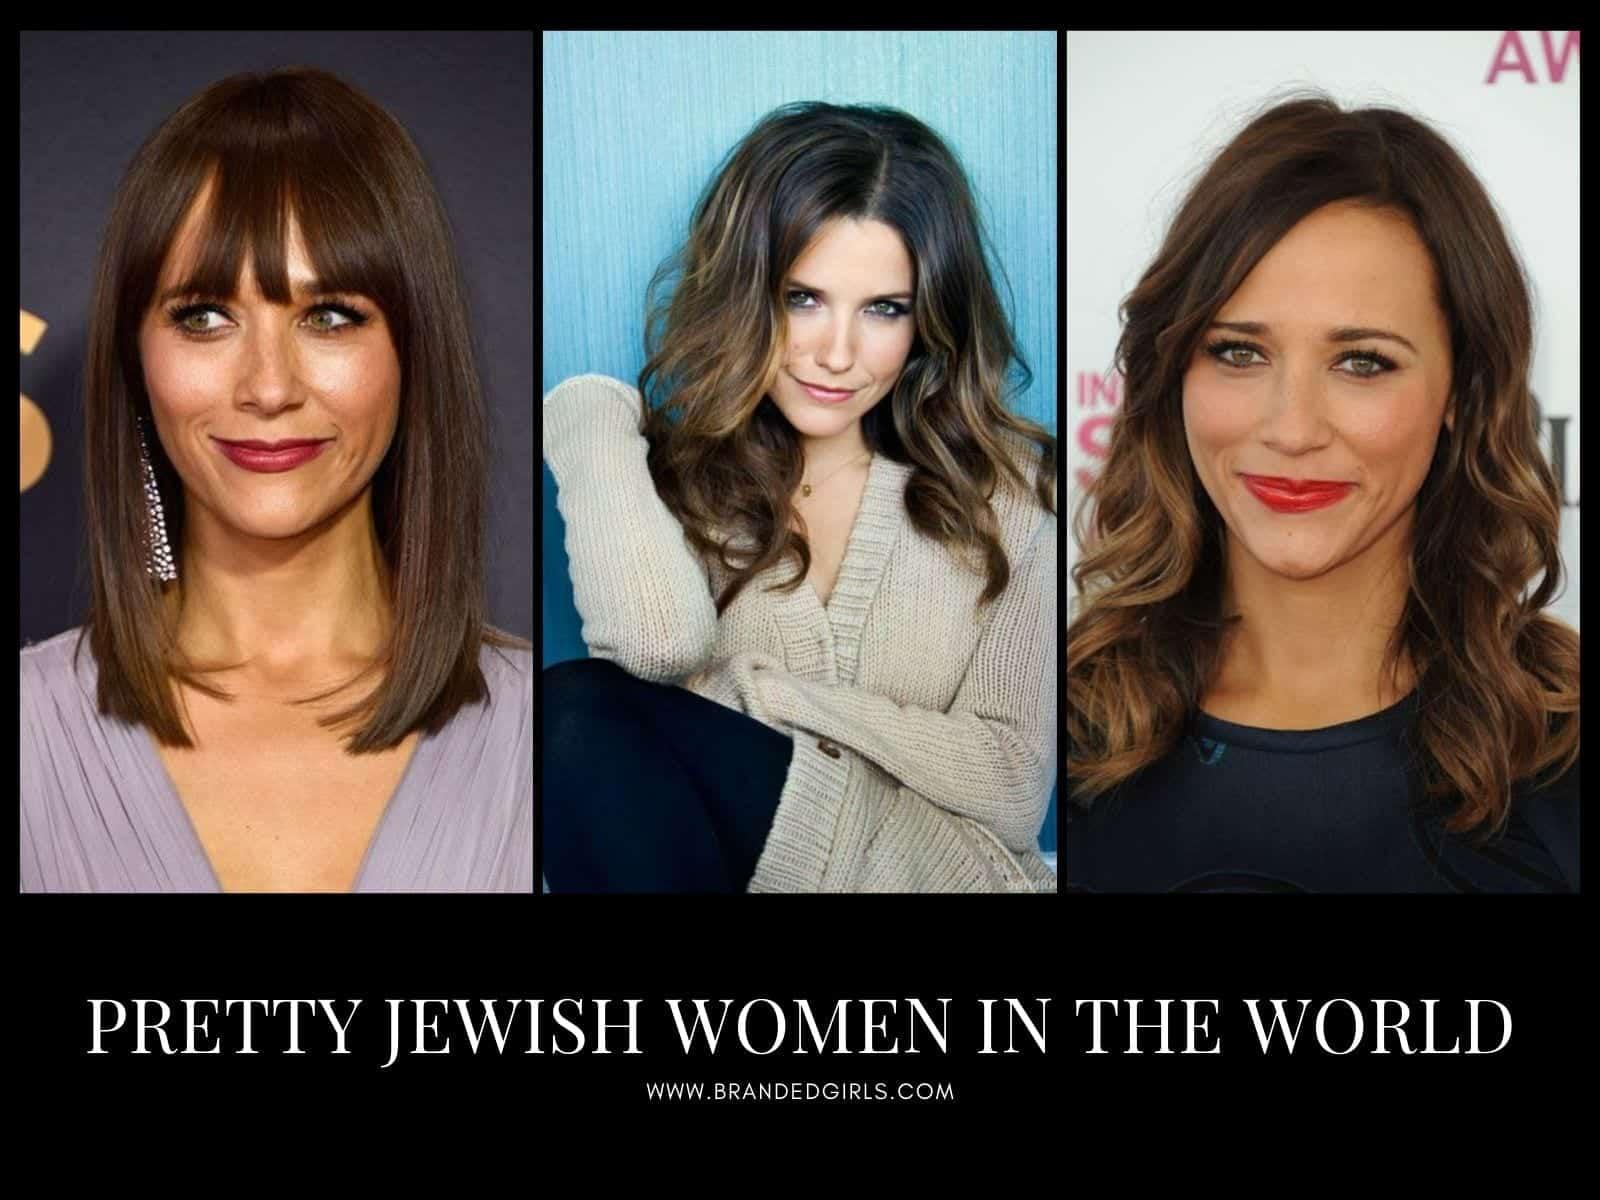 Most-Pretty-Jewish-Women-in-the-World Cute Jewish Girls - 30 Most Pretty Jewish Women in the World